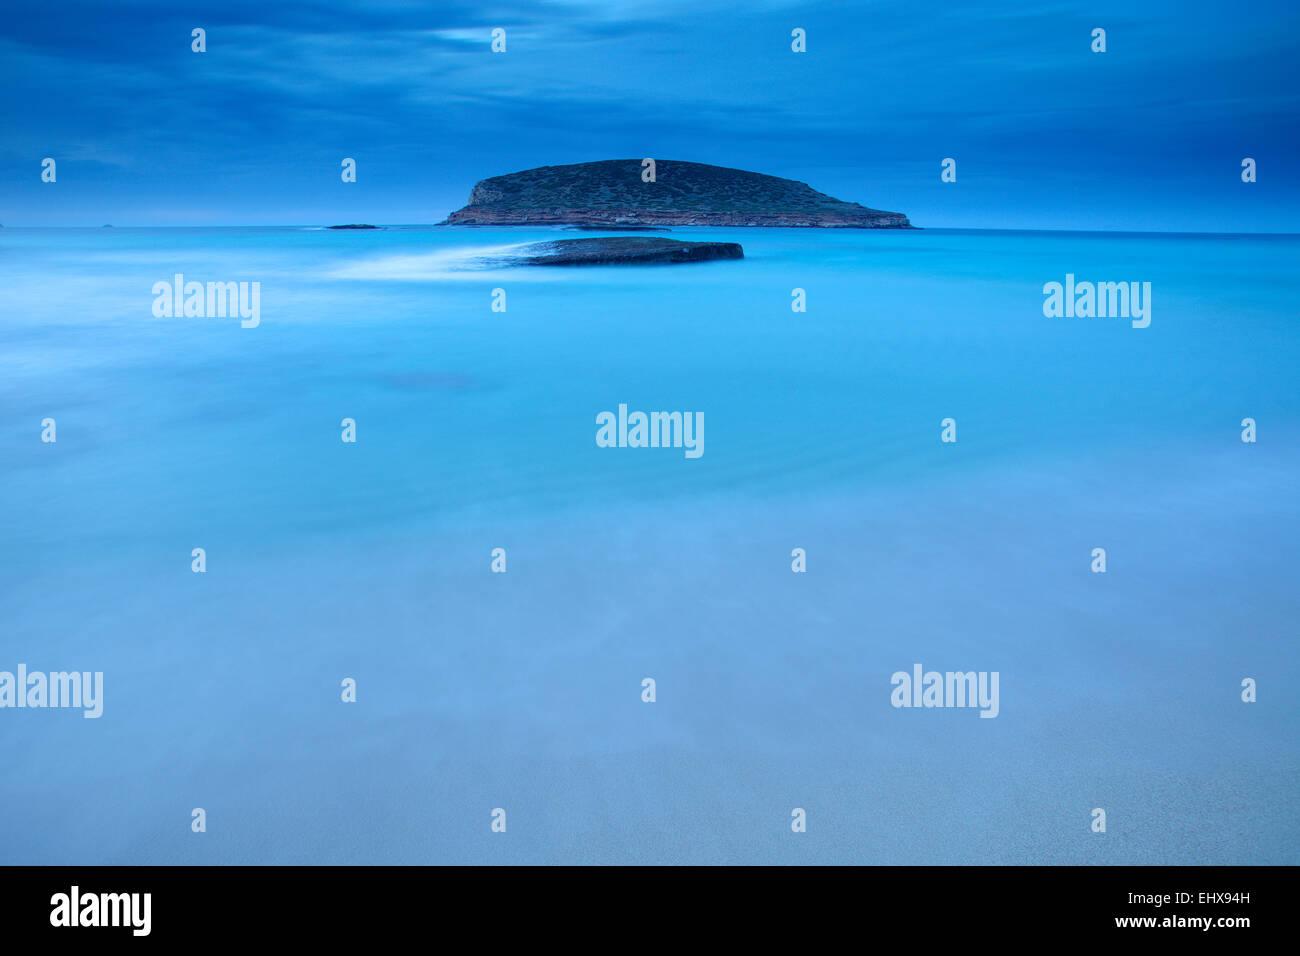 Spain, Ibiza, Cala Comte at blue hour - Stock Image